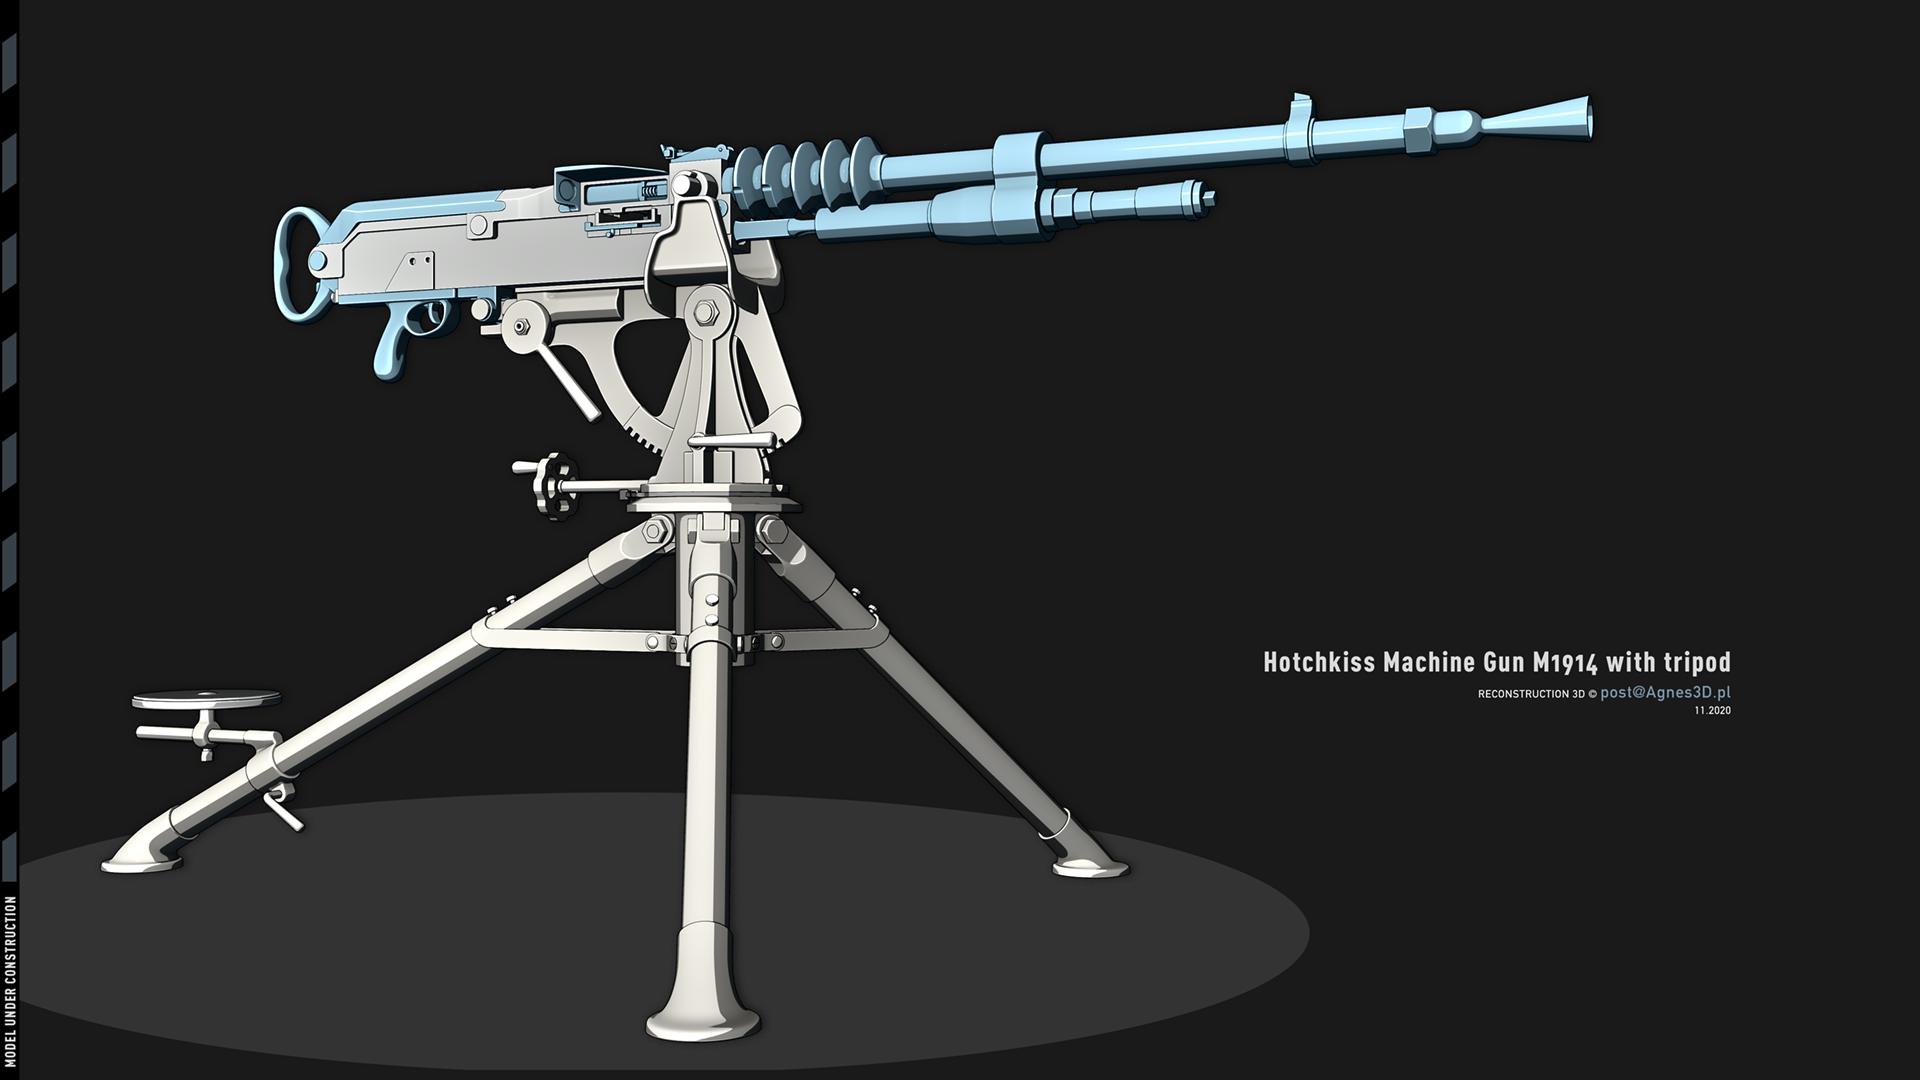 Hotchkiss Machine Gun M1914